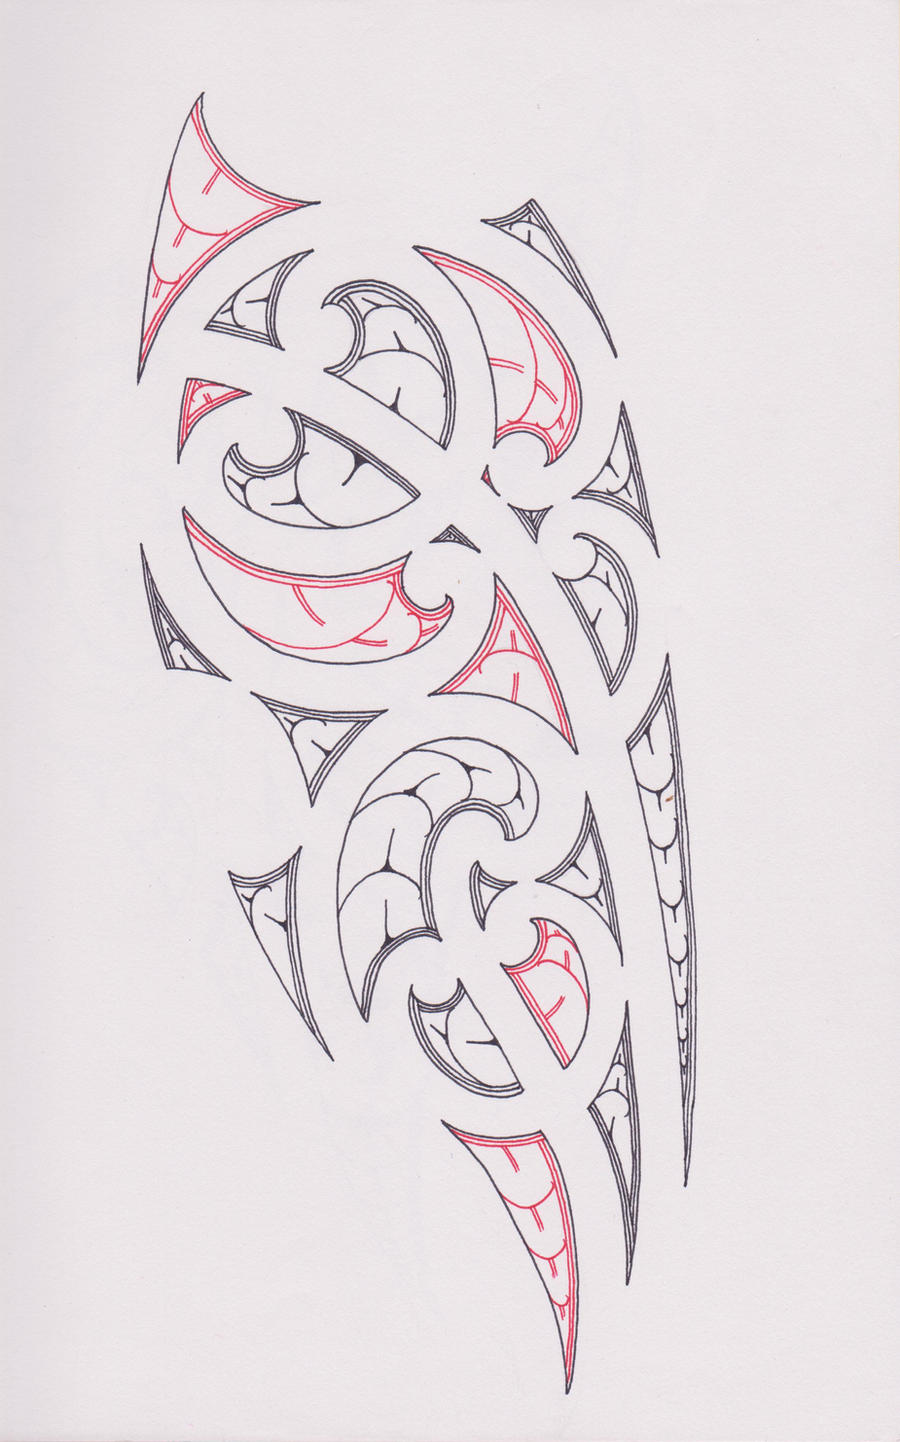 designs interfaces tattoo design 2012 2014 bloodempire ta moko design ...